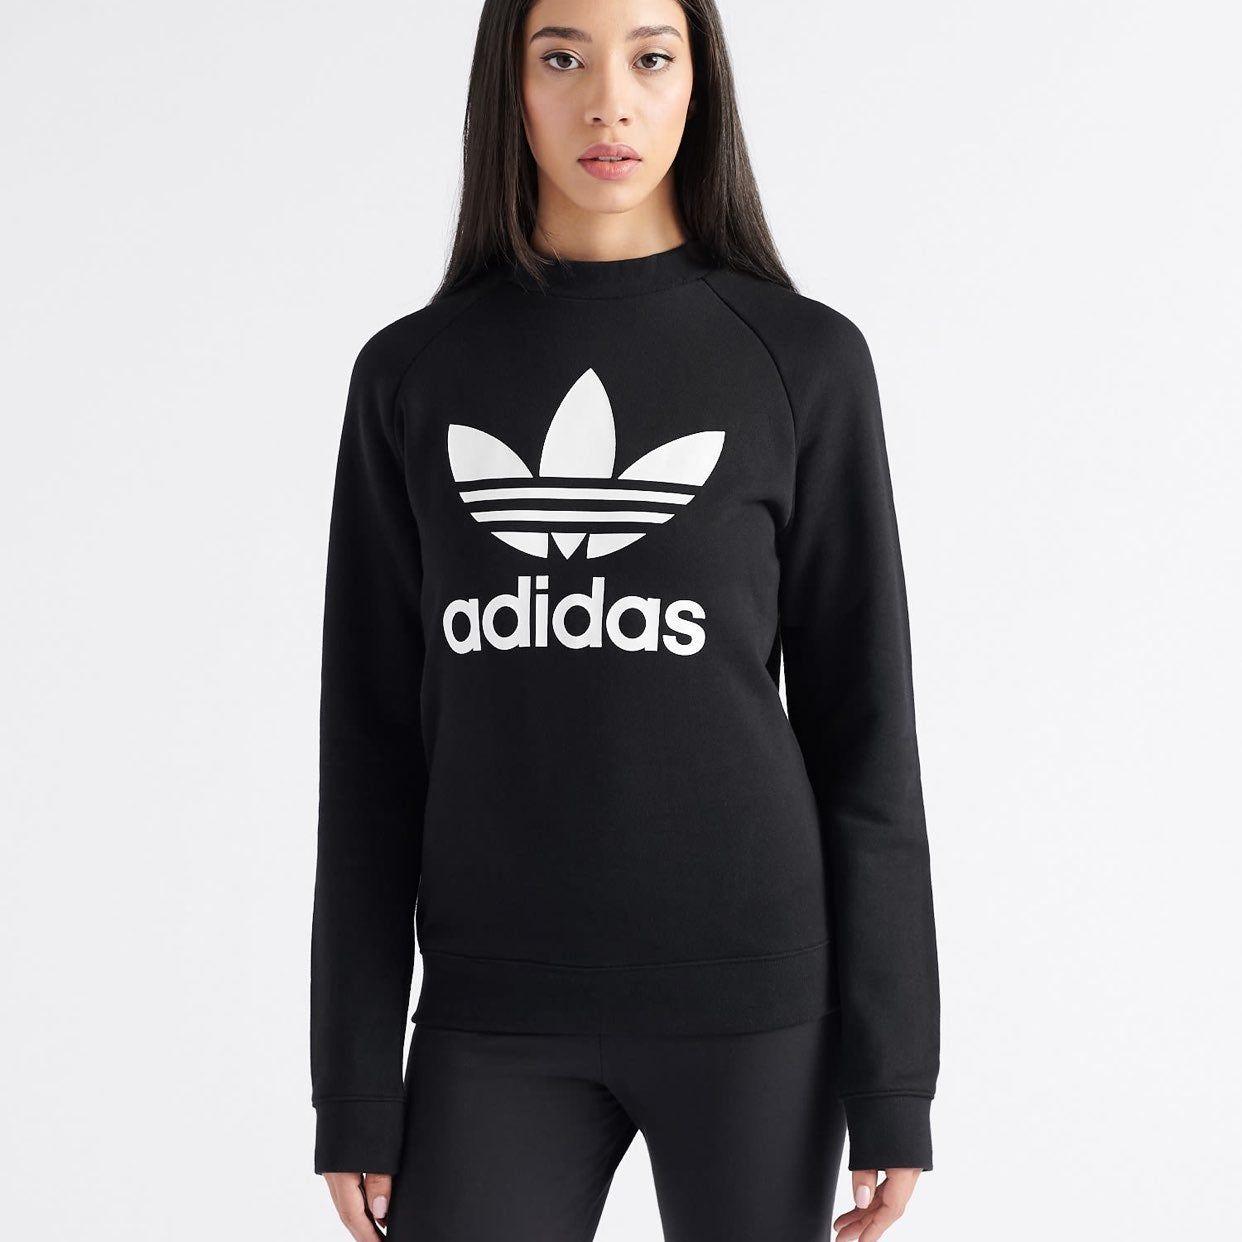 Nwt Adidas Womens Size S Black Crewneck Sweatshirt With White Trefoil Logo Raglan Sleeves Hip Leng Sweatshirts Crew Neck Sweatshirt Black Crewneck Sweatshirt [ 1242 x 1242 Pixel ]